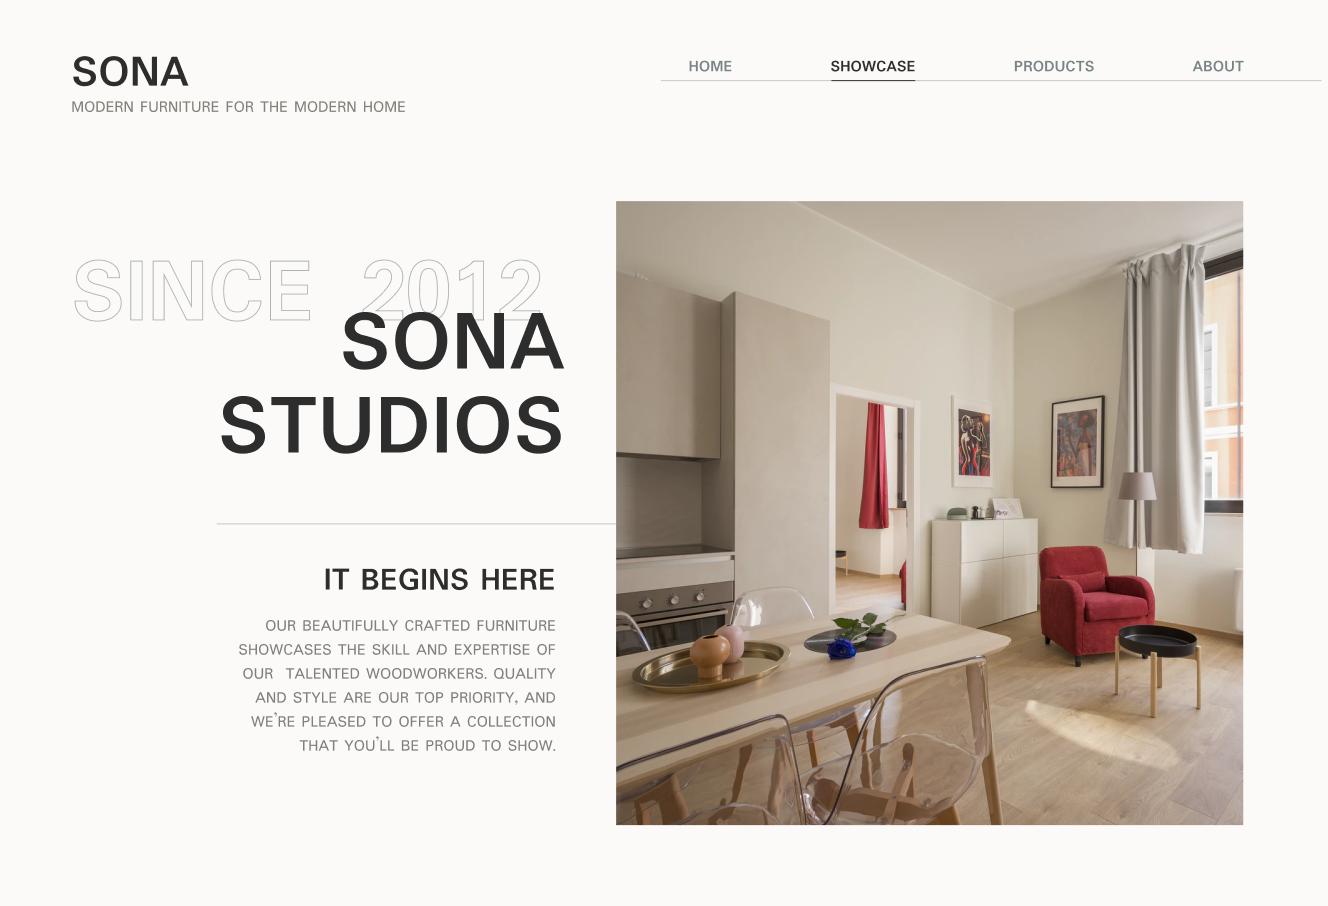 Sona Studios - website design for a modern furniture store